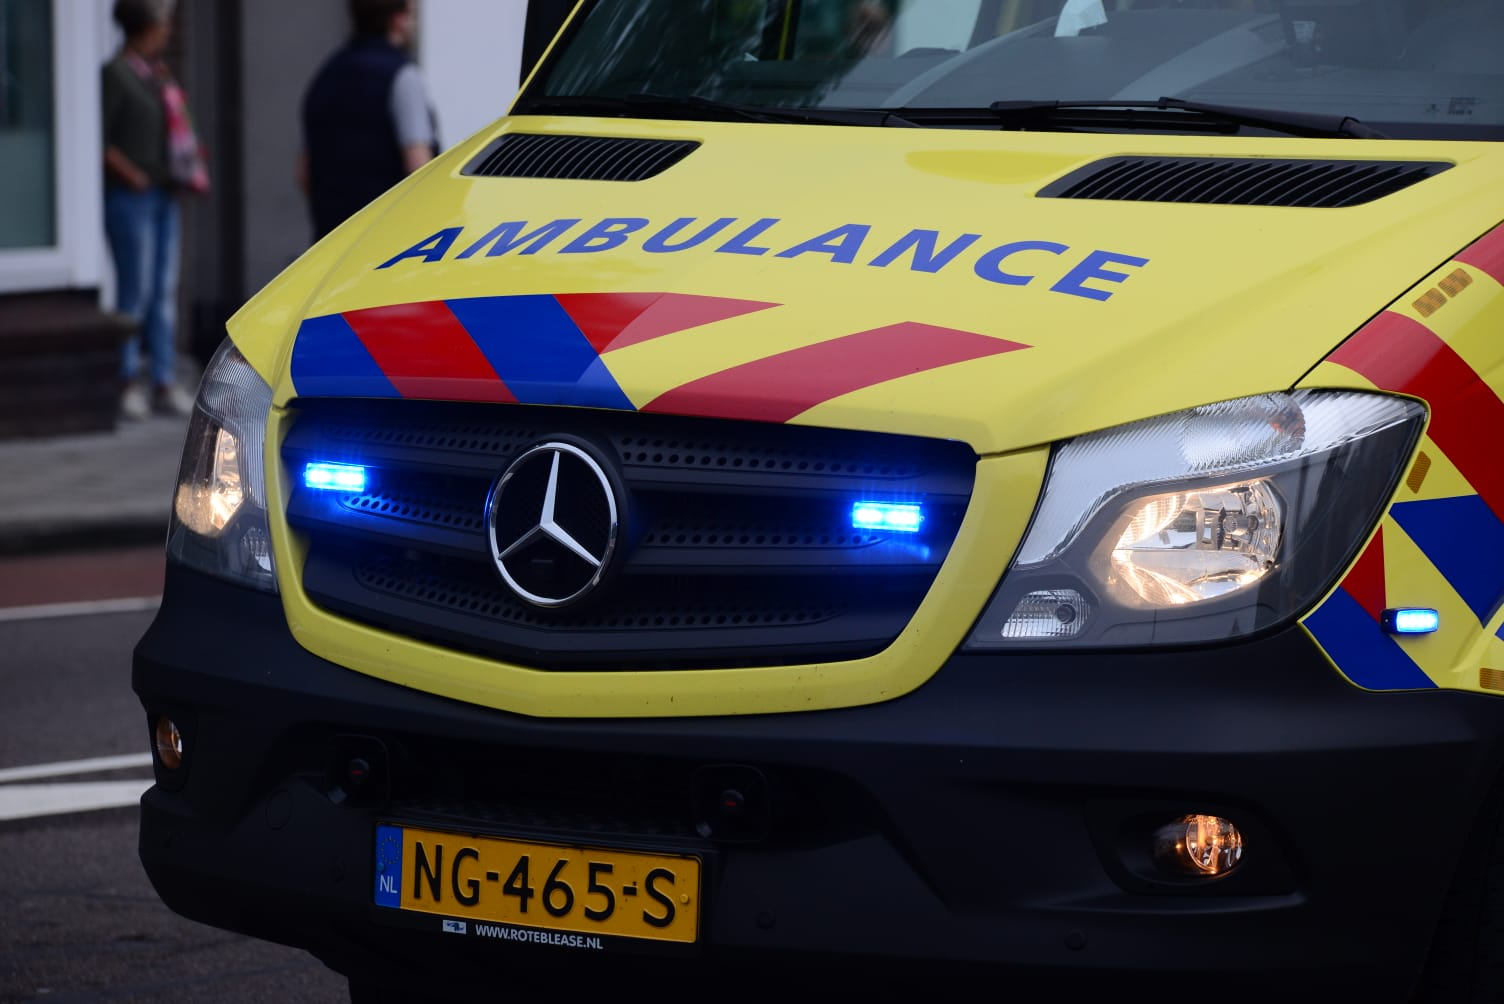 Twee zwaargewonden na ernstig ongeluk Noordzeeweg Rozenburg